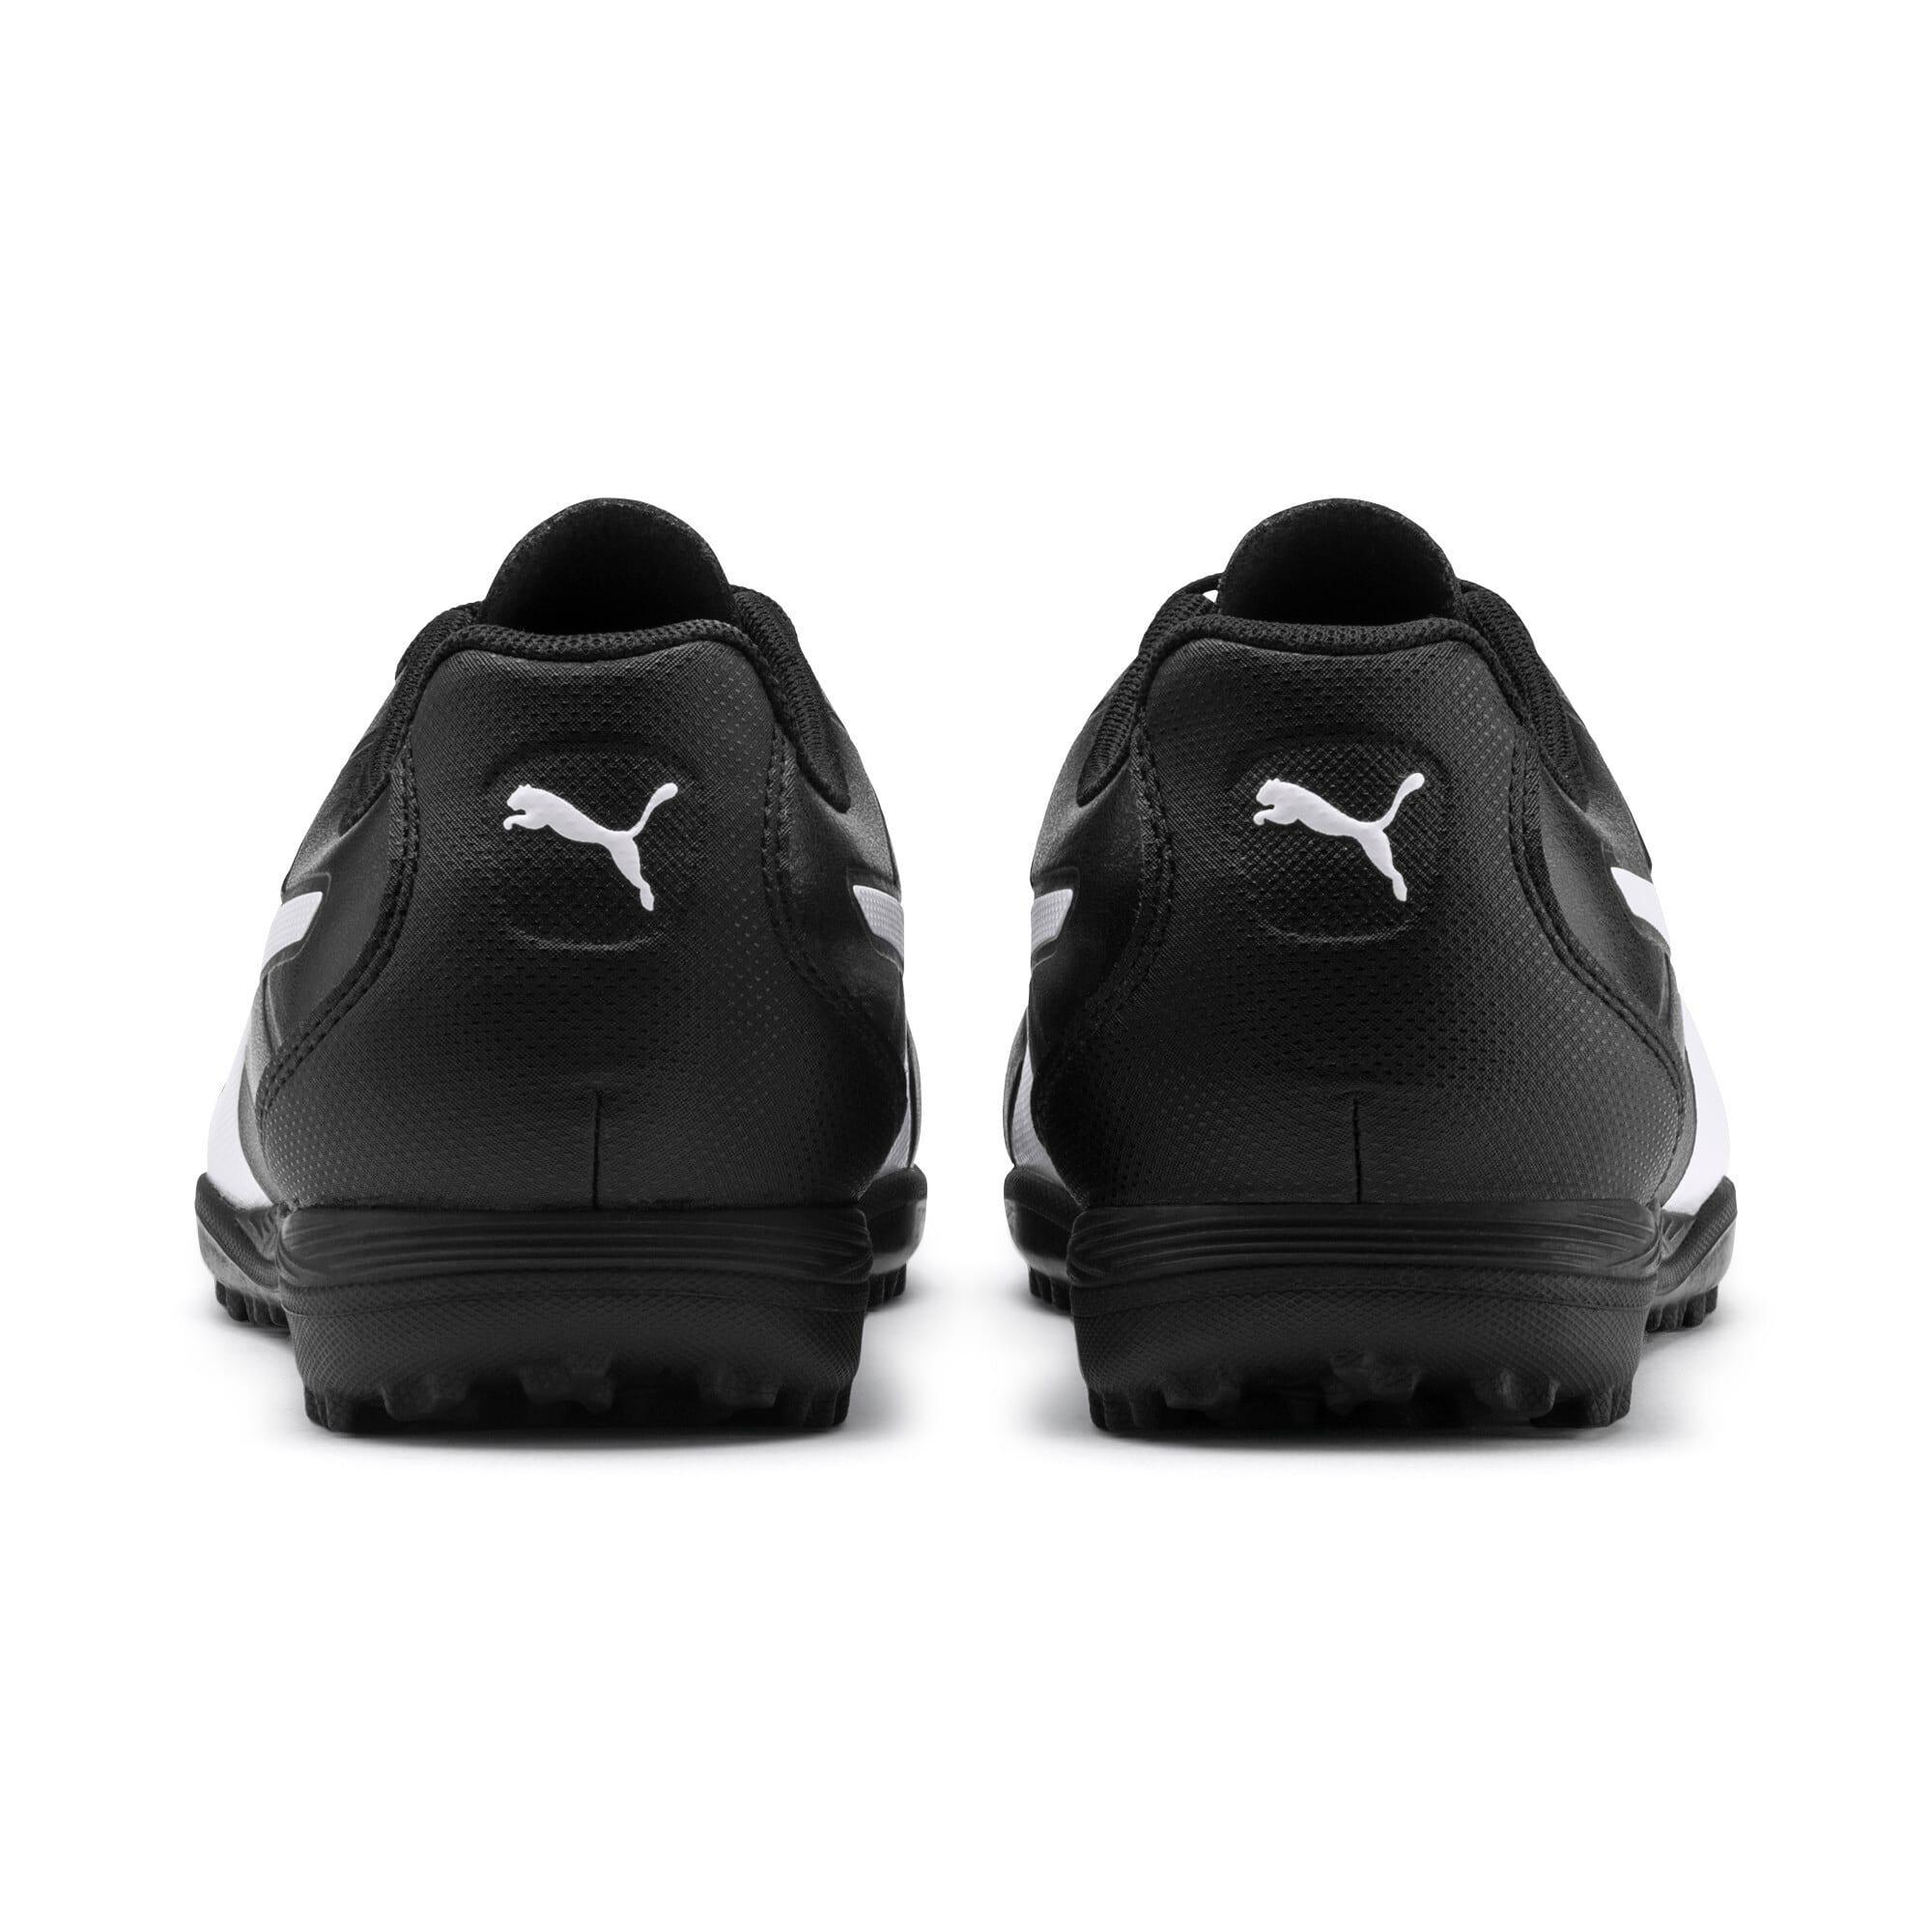 Thumbnail 4 of Monarch TT Youth Football Boots, Puma Black-Puma White, medium-IND